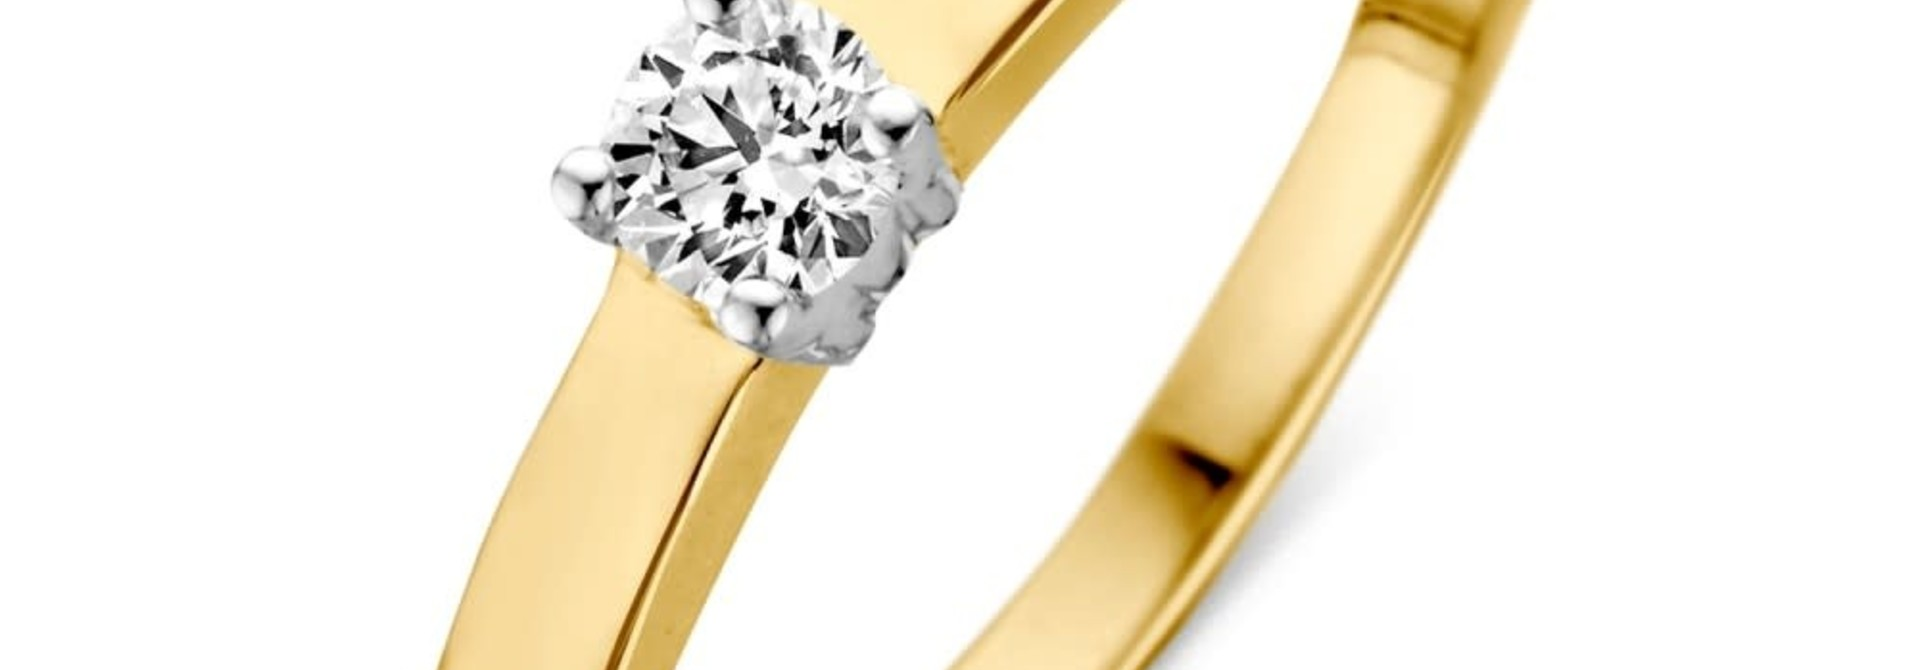 Ring bicolor zirconia RH425874